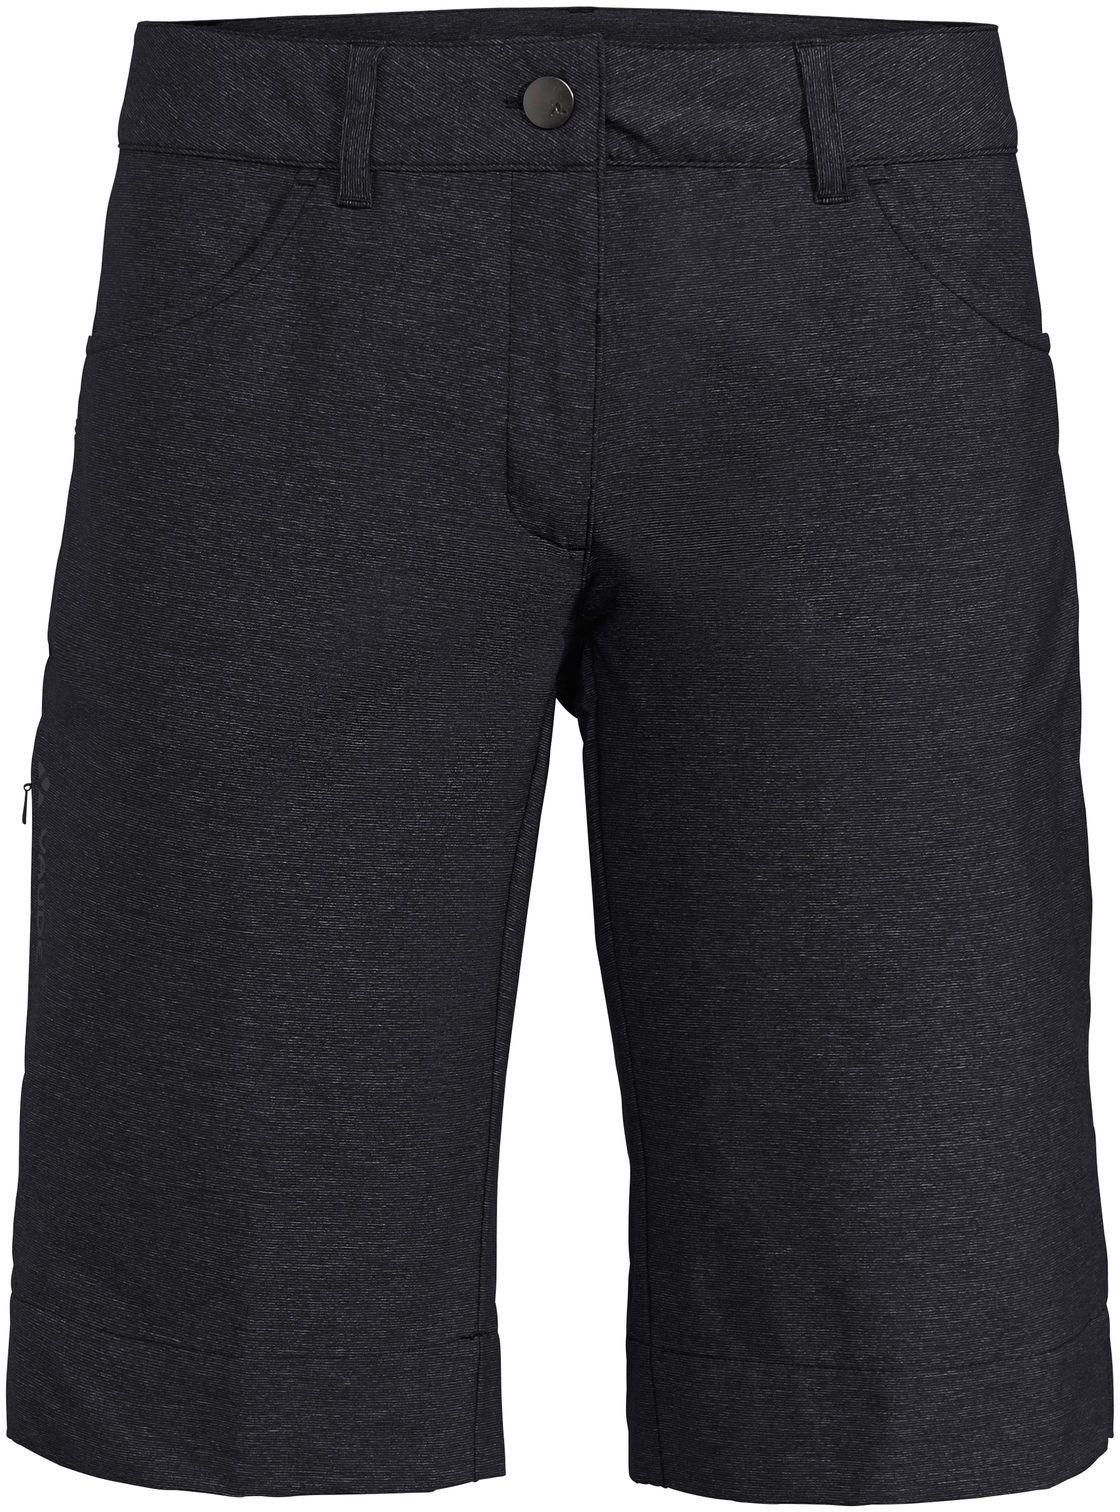 Vaude Women's Turifo Shorts - black XS